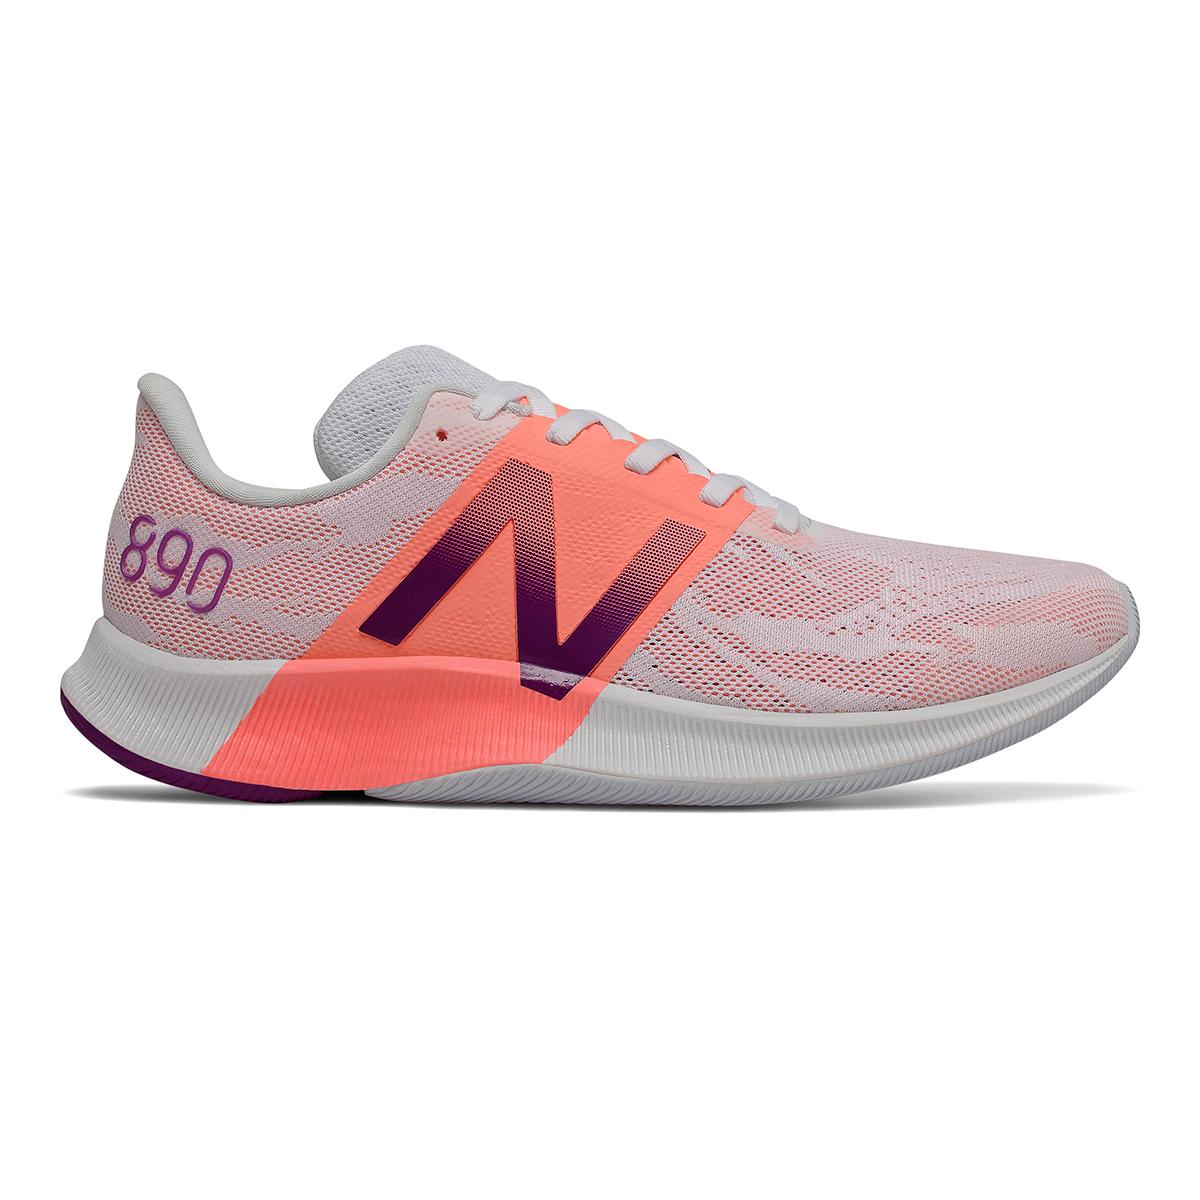 Women's New Balance 890V8 Running Shoe - Color: Moondust (Regular Width) - Size: 5, Moondust, large, image 1